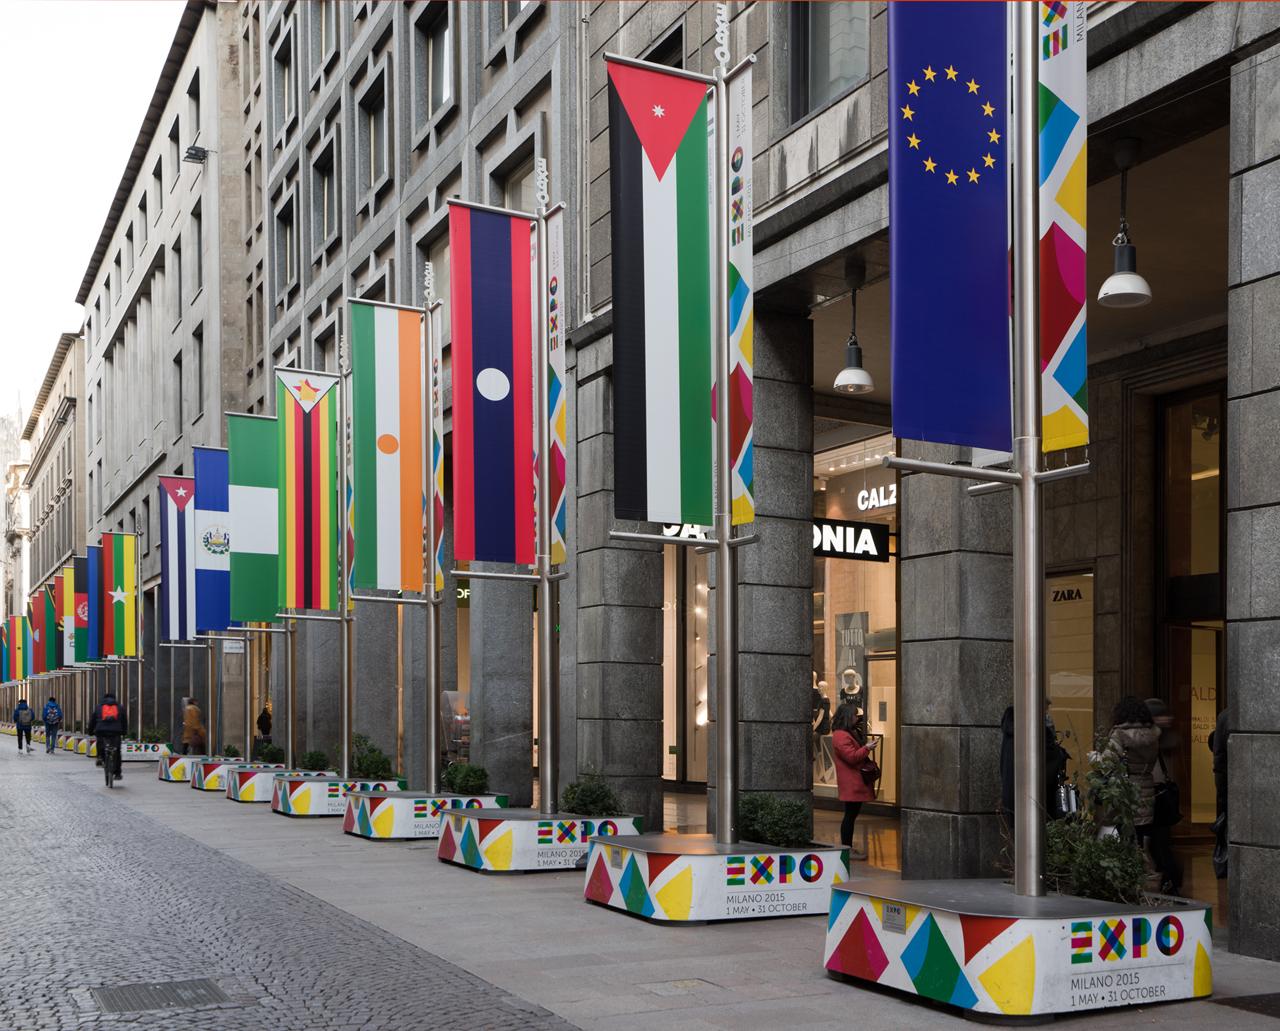 flags-boulevard_dsc04954_photo-by-andrea-martiradonna